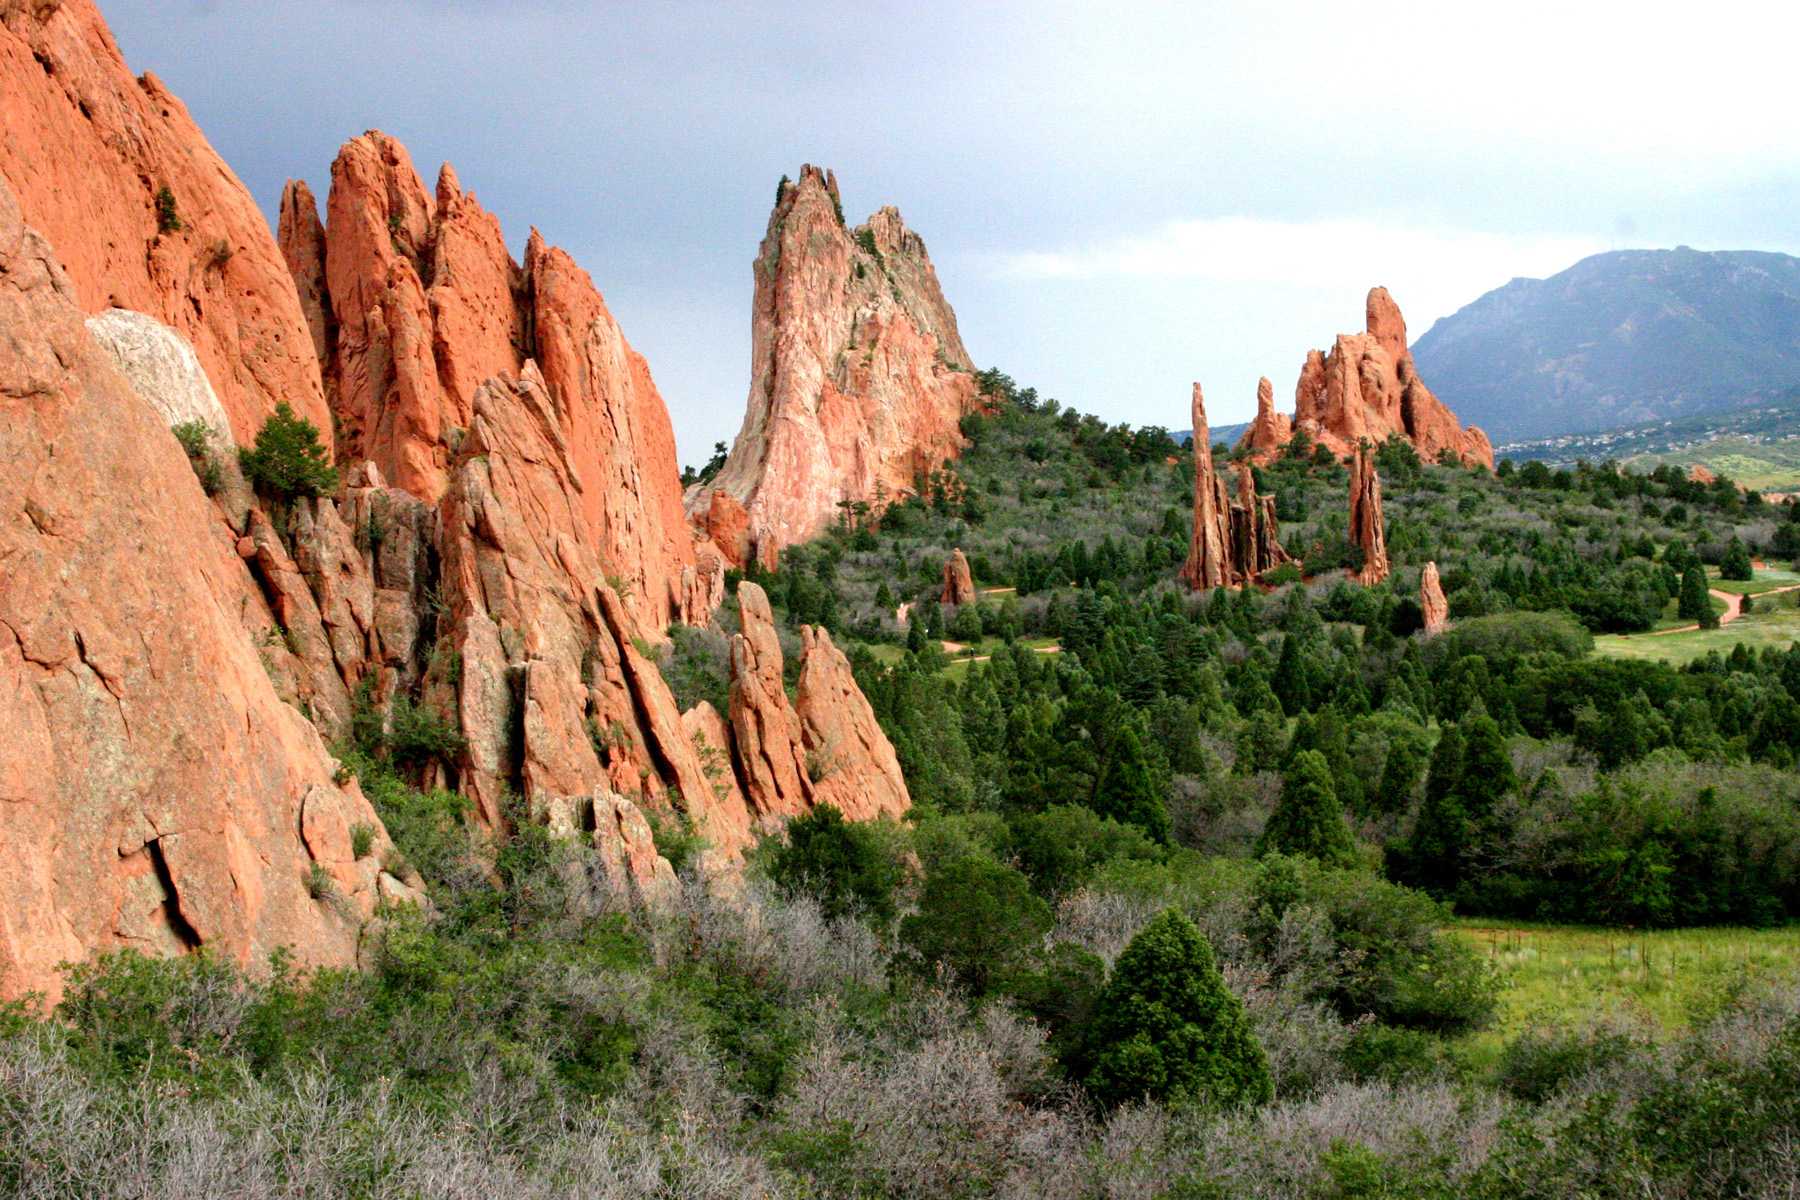 photos_Palo_Duro_Canyon_State_Park-_Over